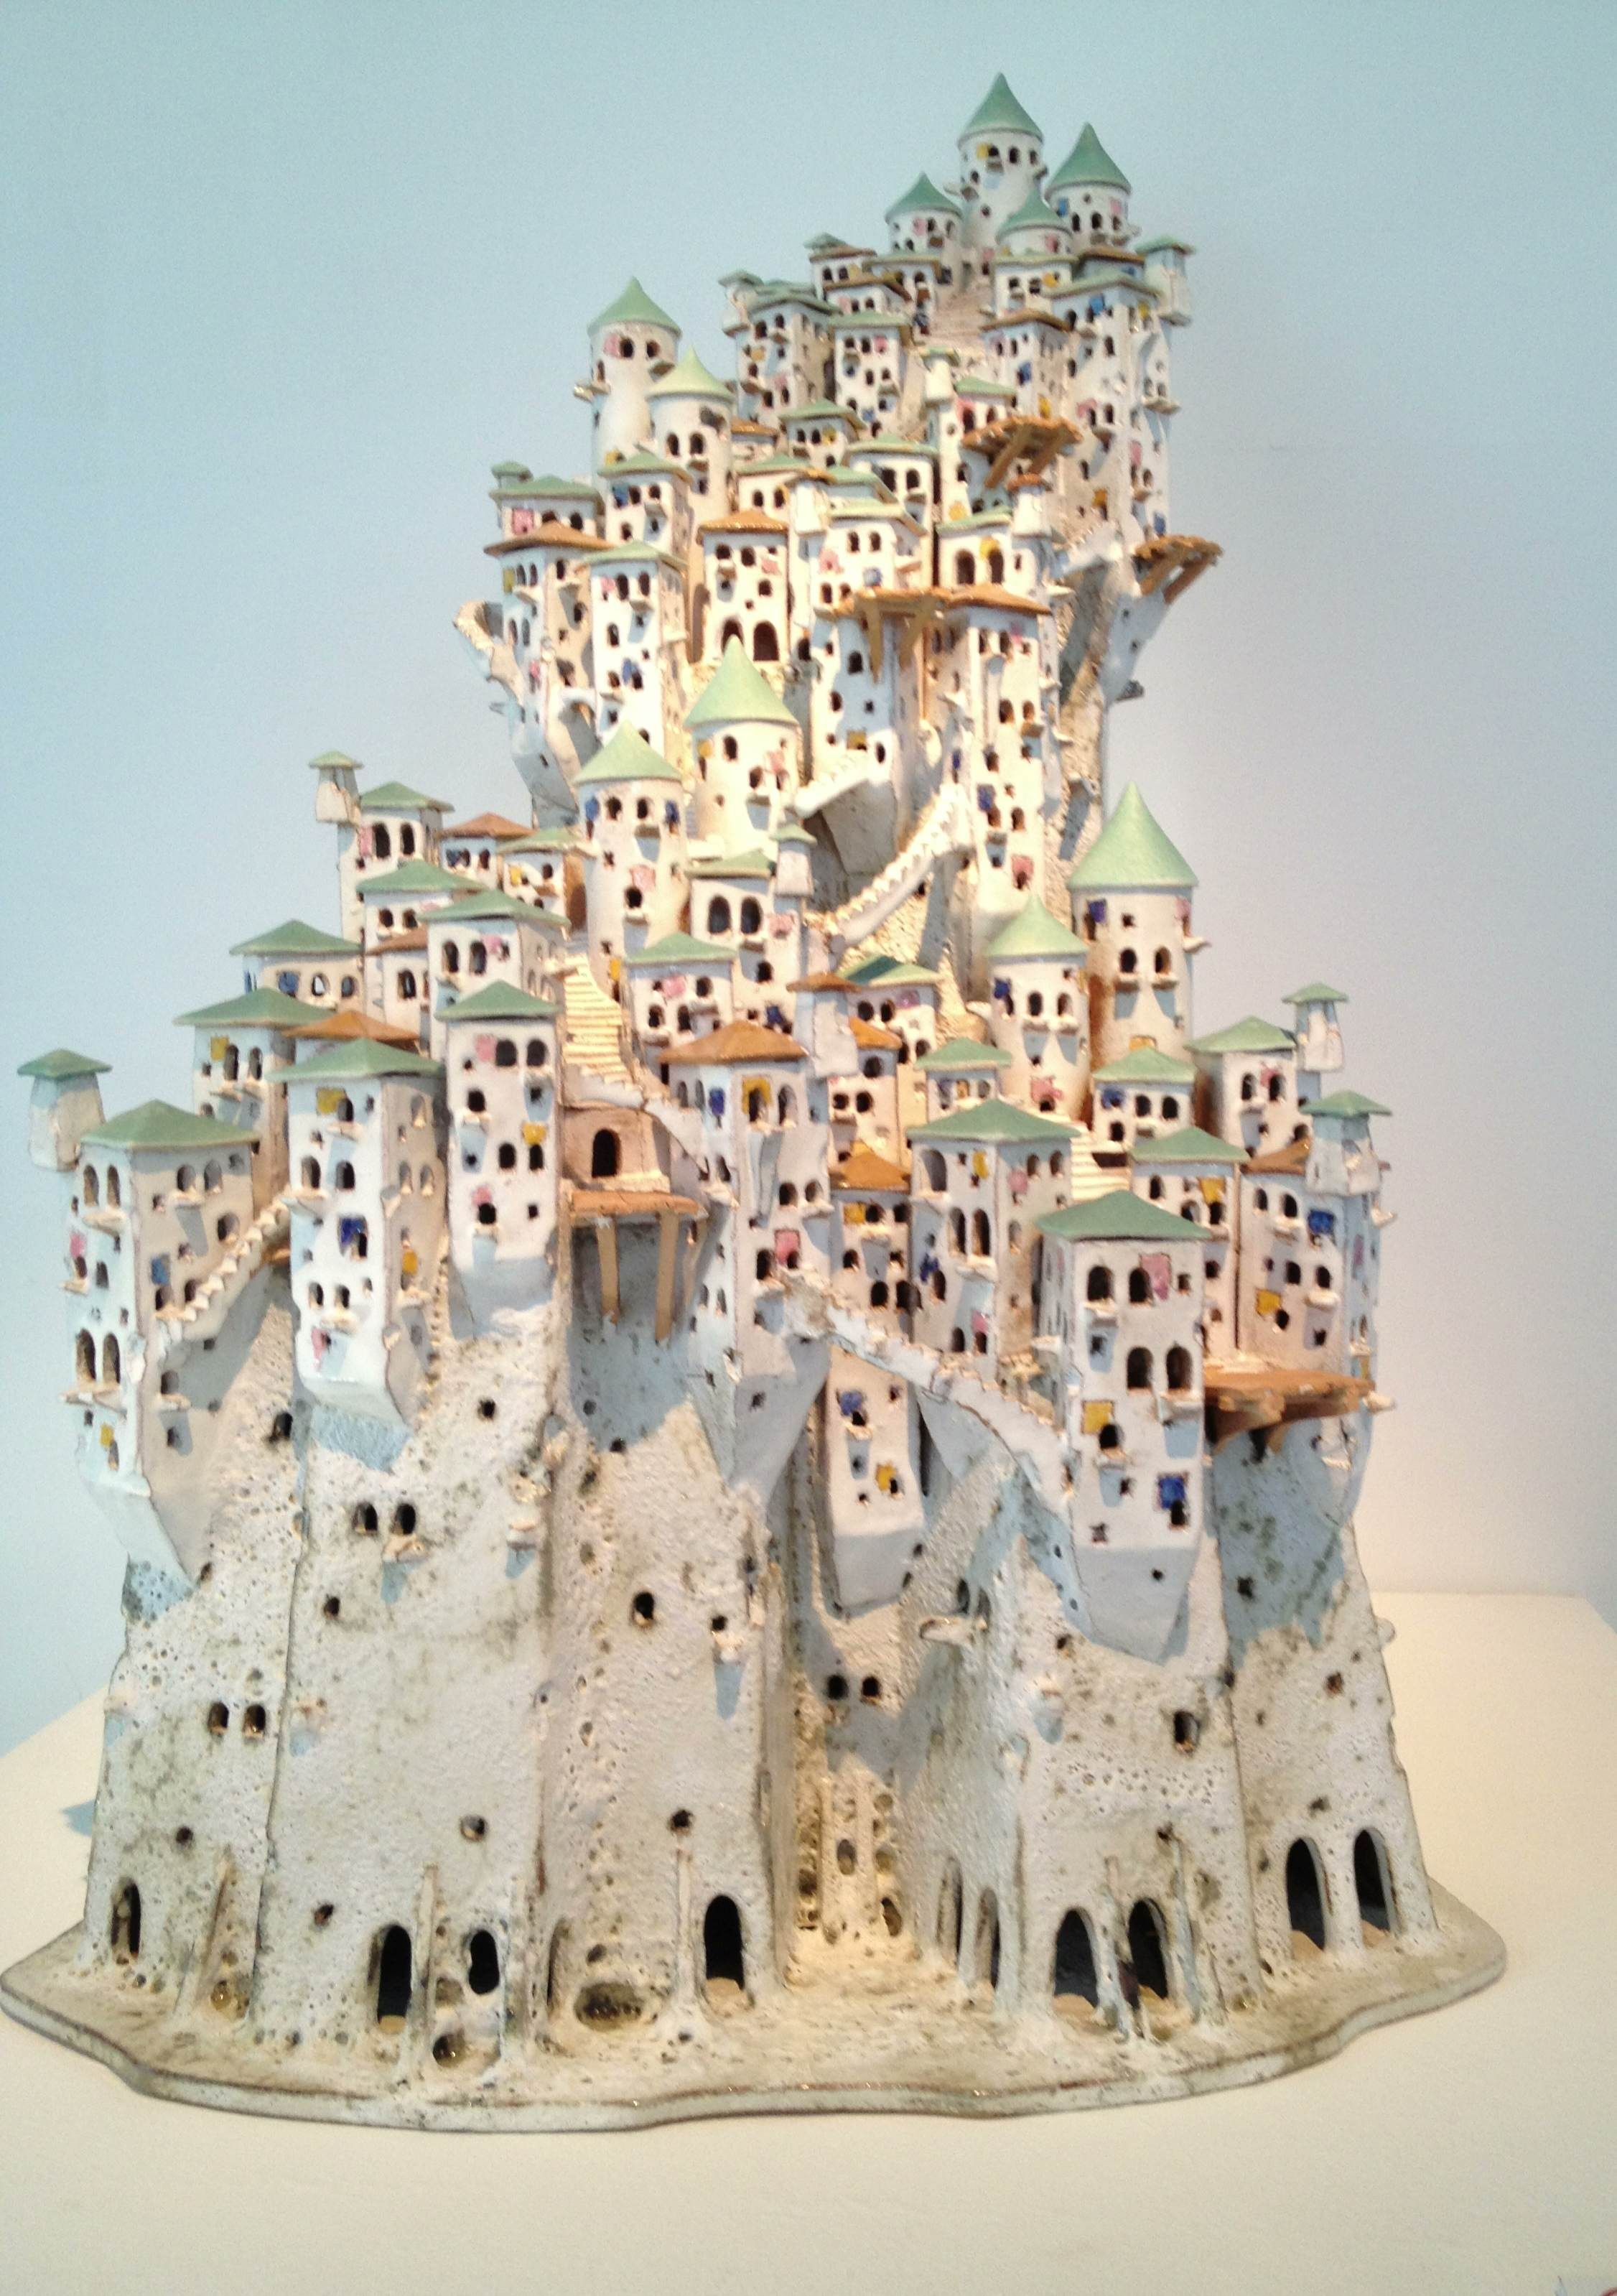 In Yingge Ceramics Museum Taiwan 배경 공예 도자기 아이디어